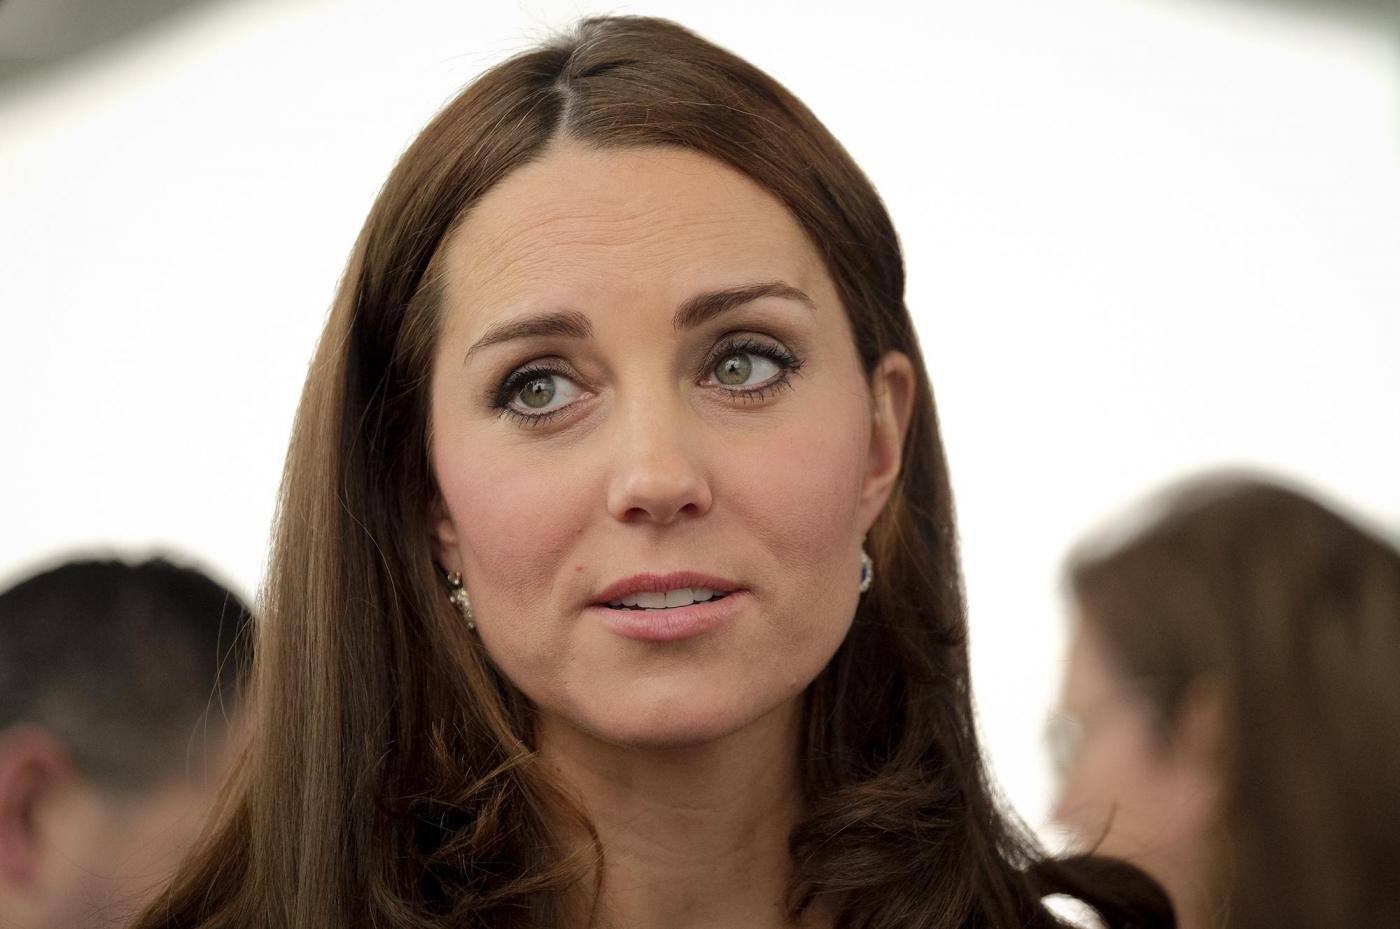 Kate Middleton torna dai Caraibi abbronzata e con un bel pancione 7